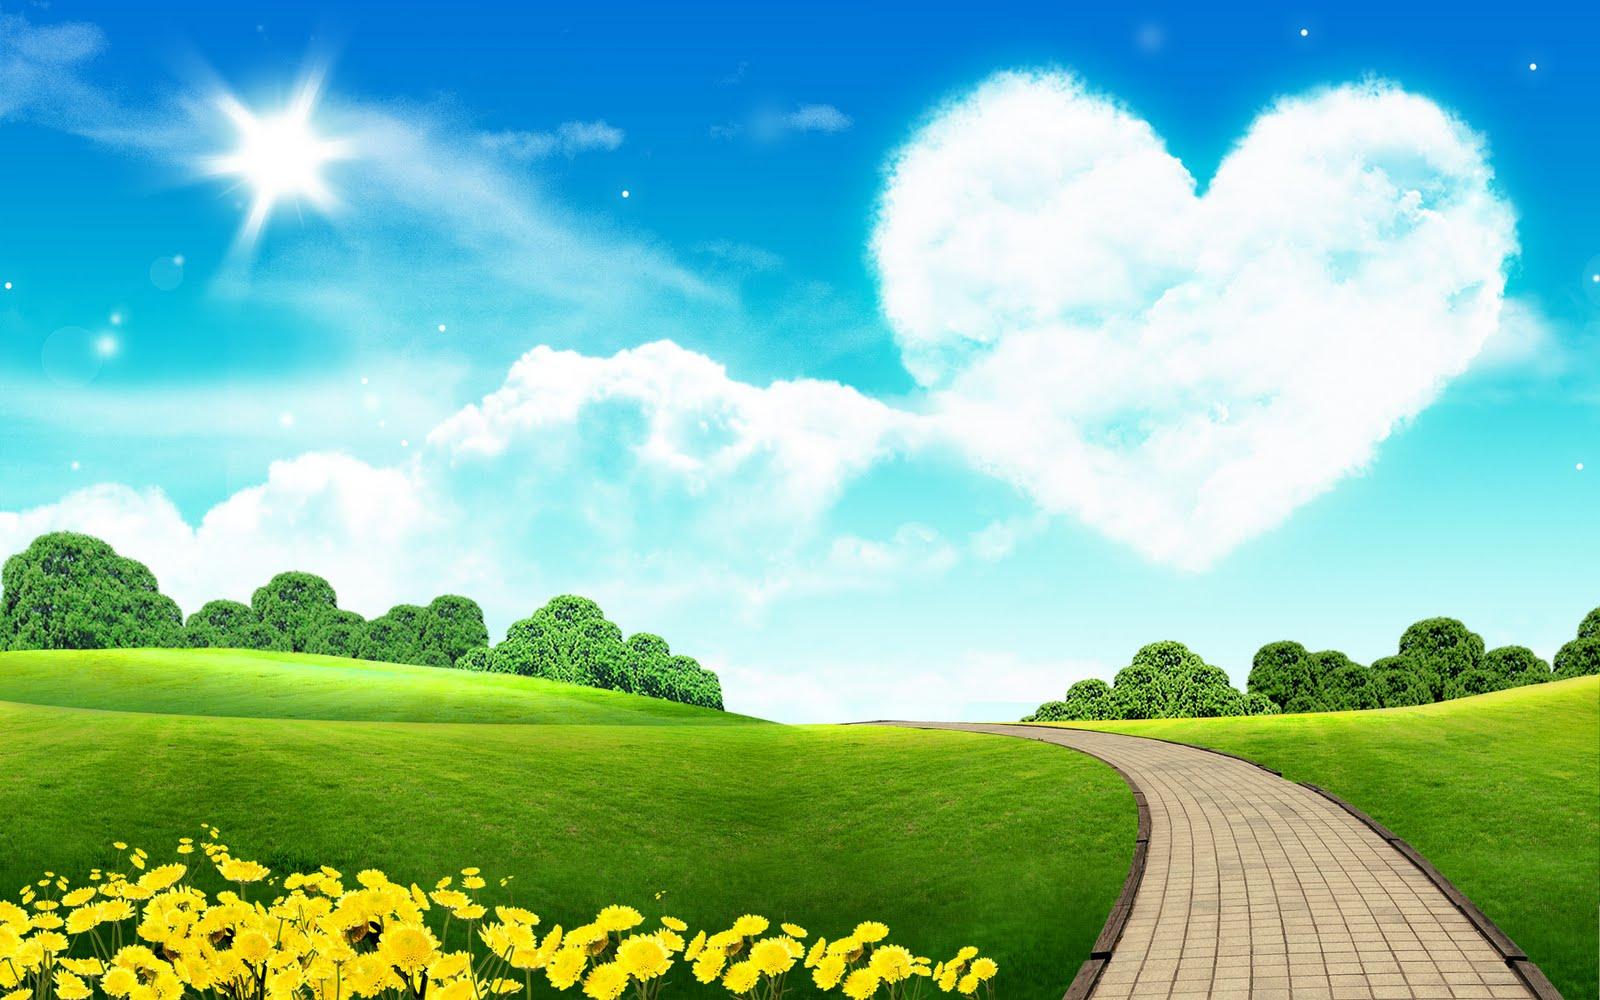 nature wallpapers mp3 download: Telugu Latest News: HD Nature Wallpaper